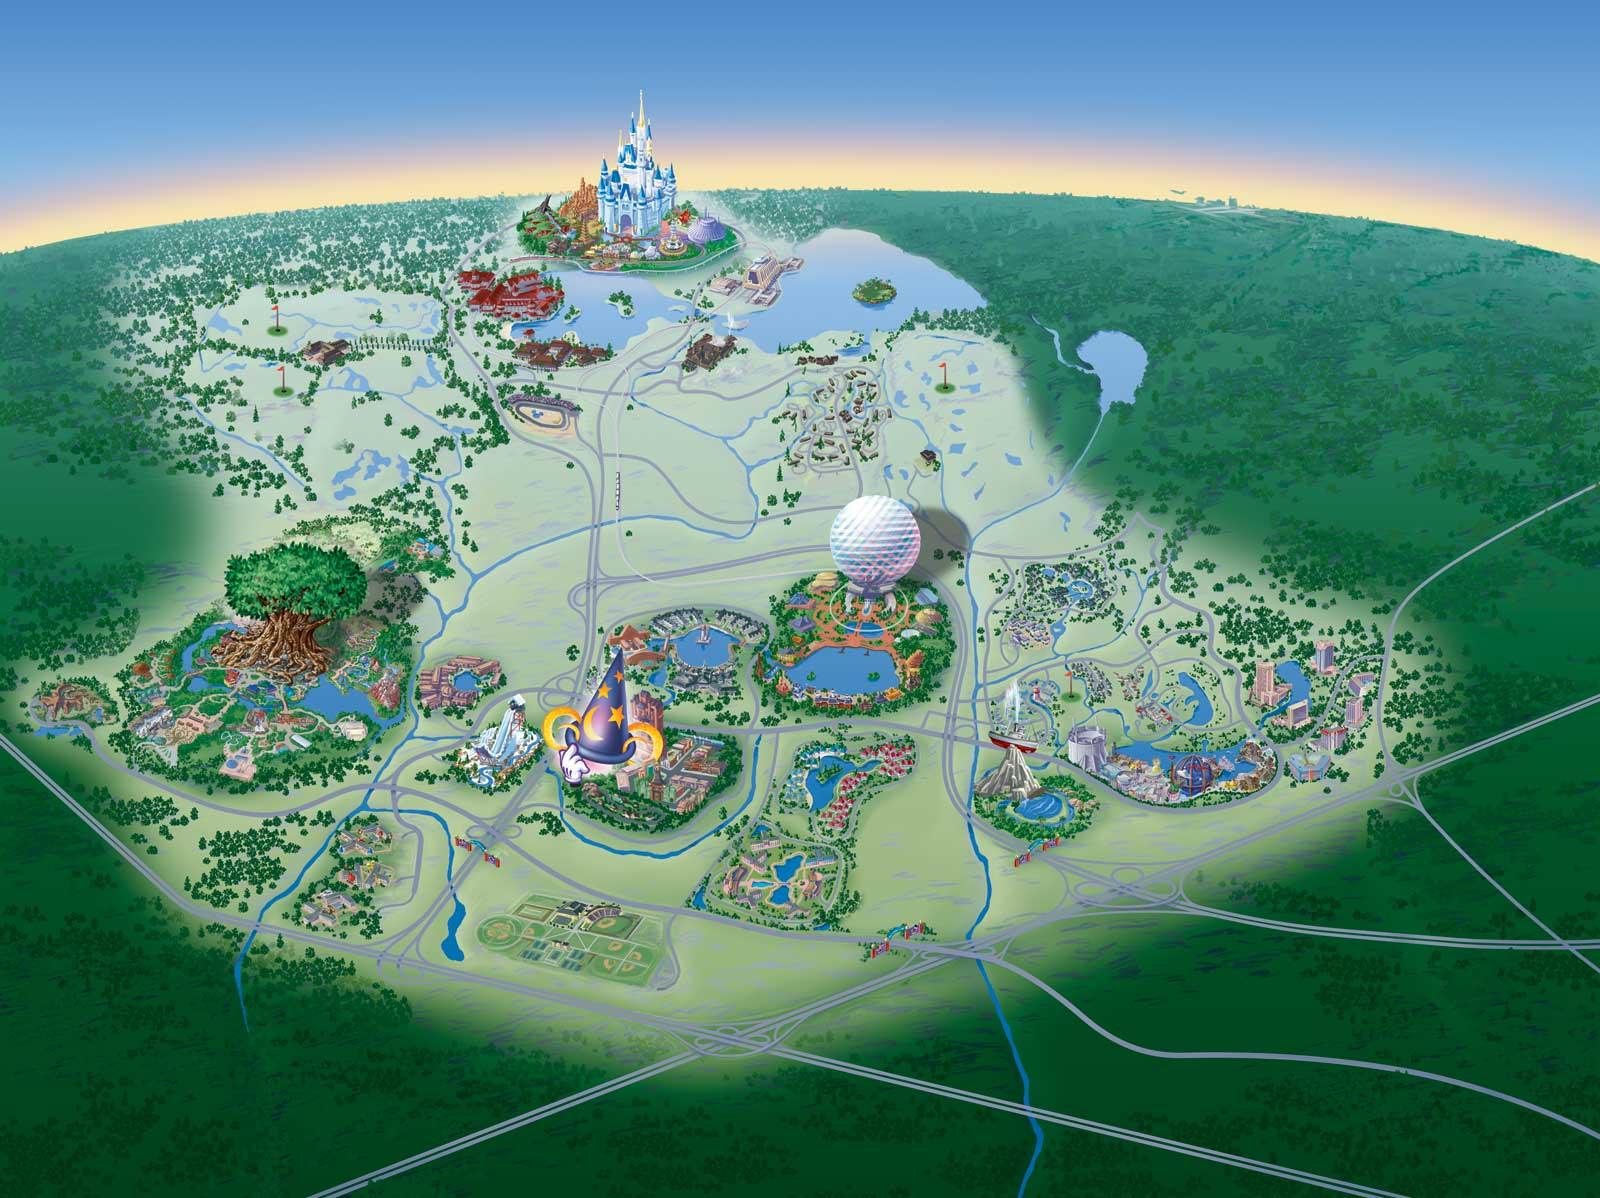 Map Of Walt Disney World Resort - Wdwinfo - Disney World Florida Hotel Map